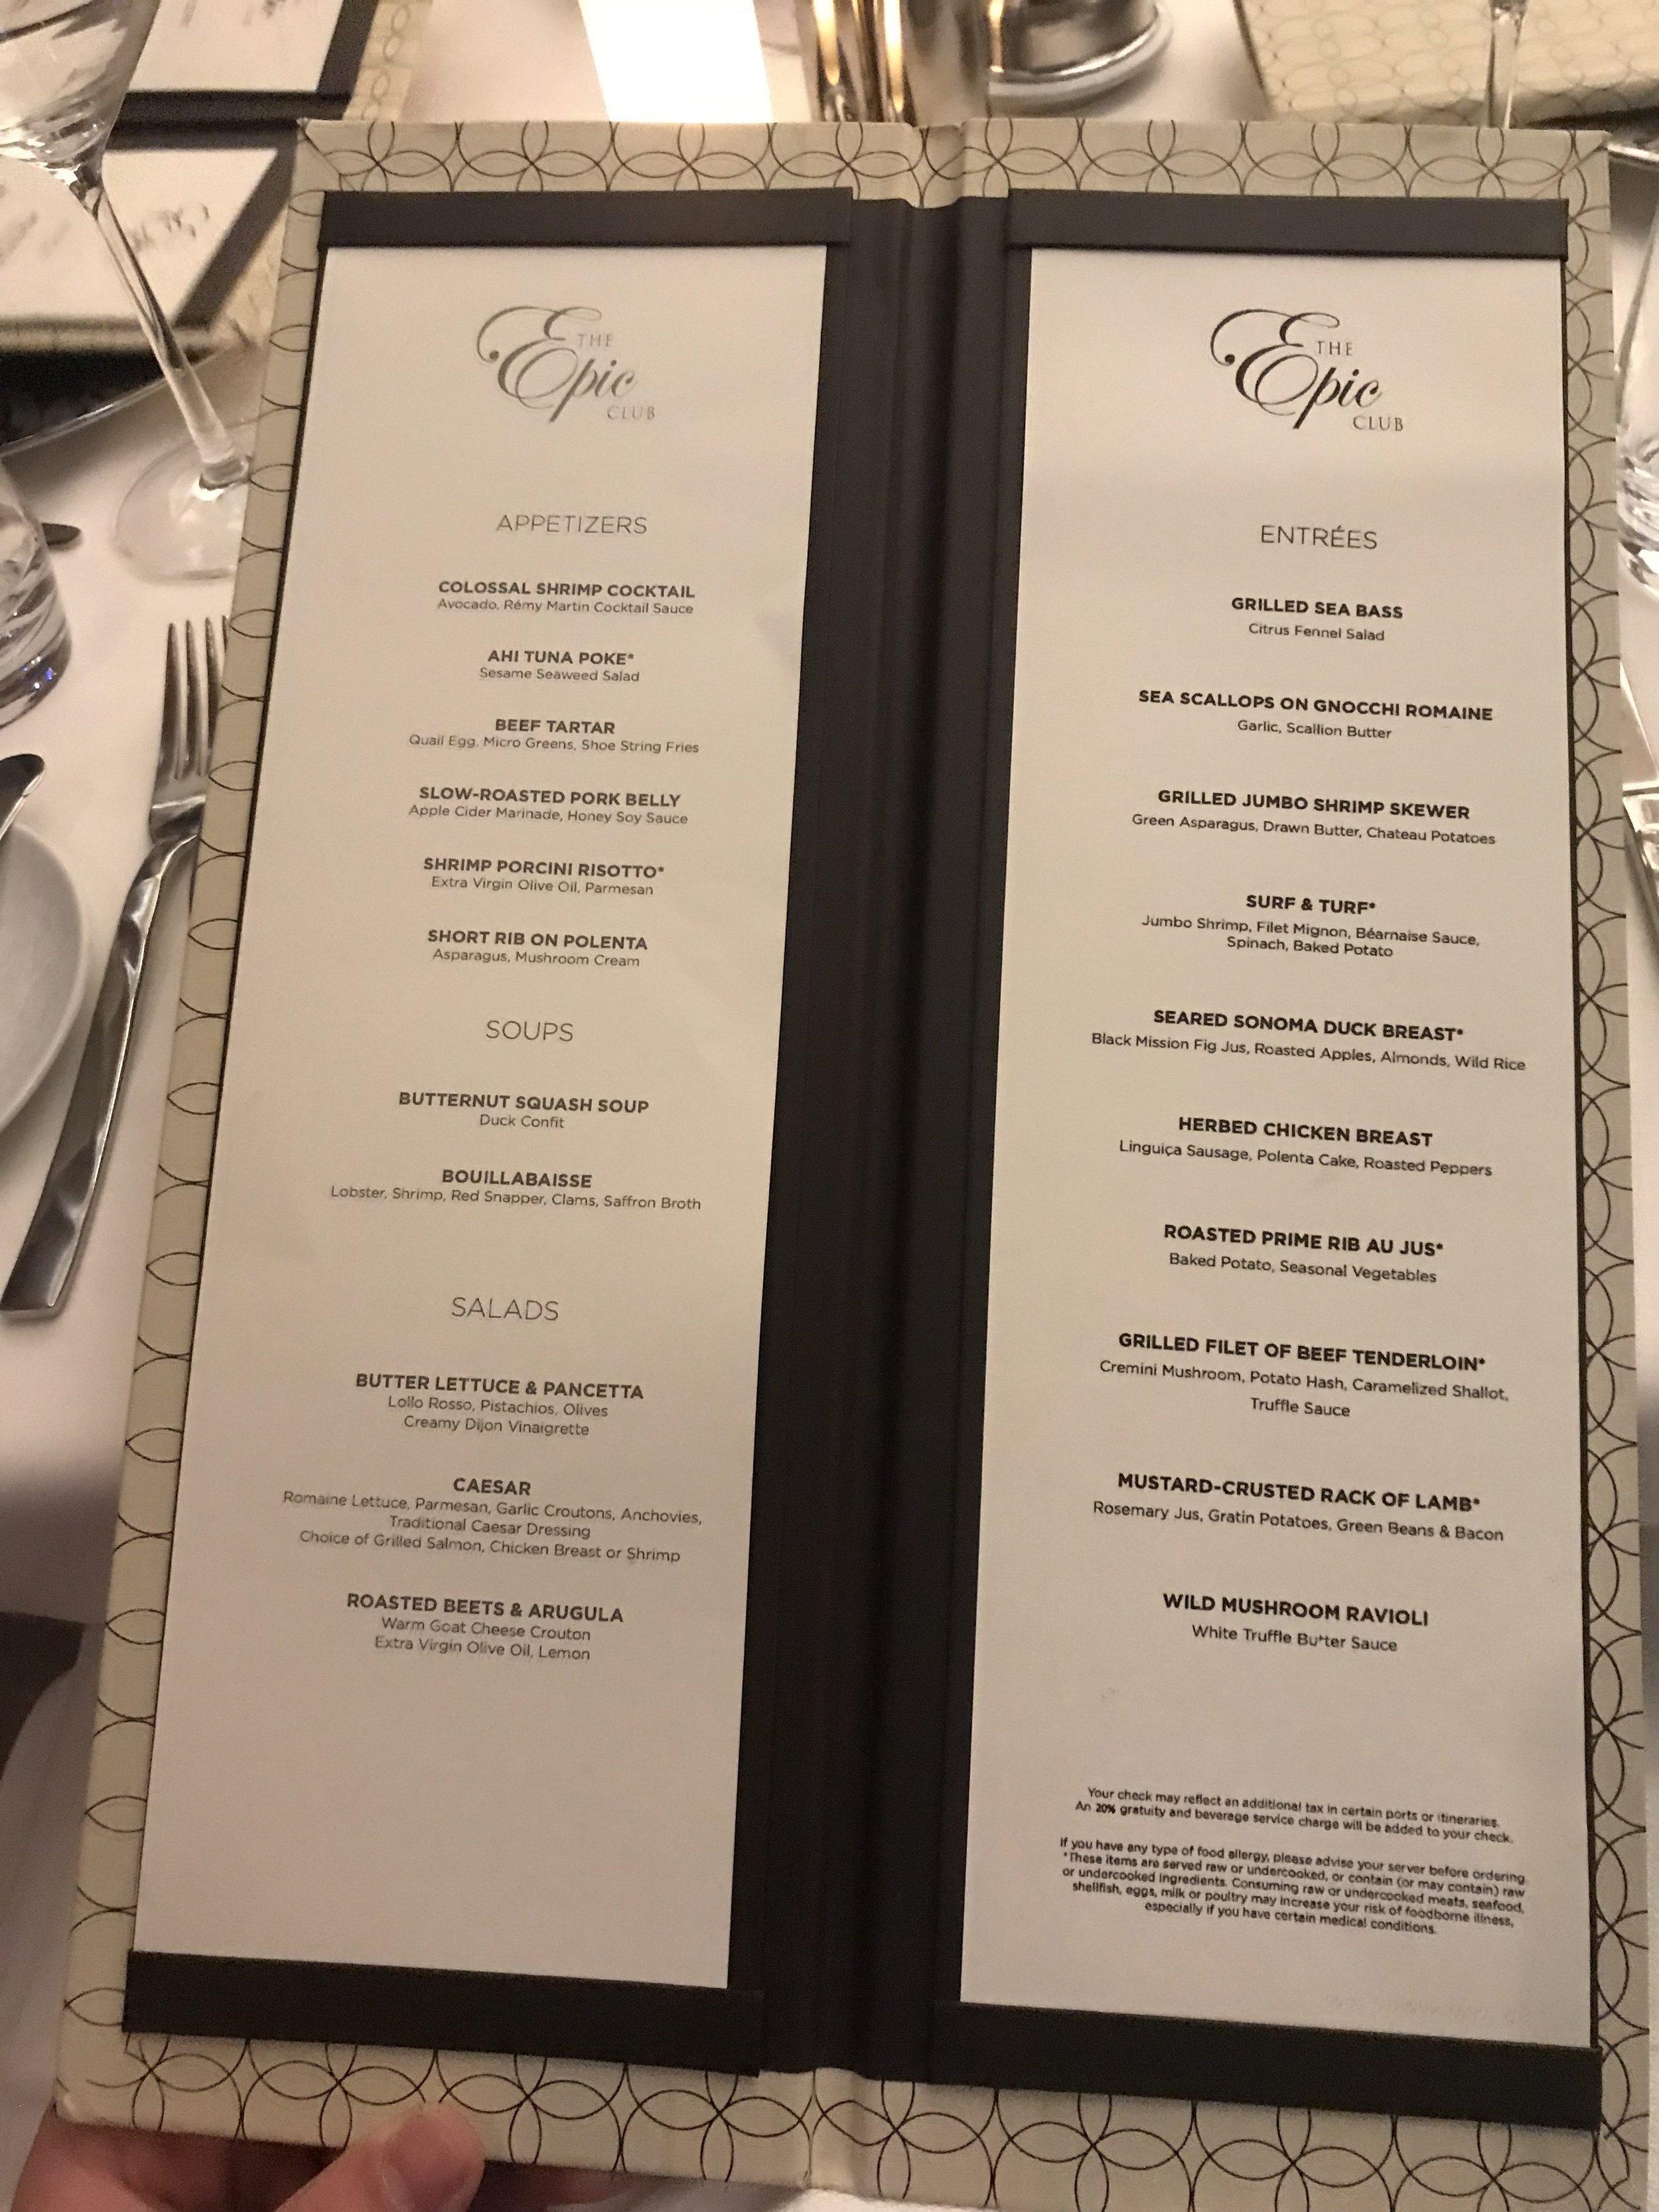 Epic Club dinner menu